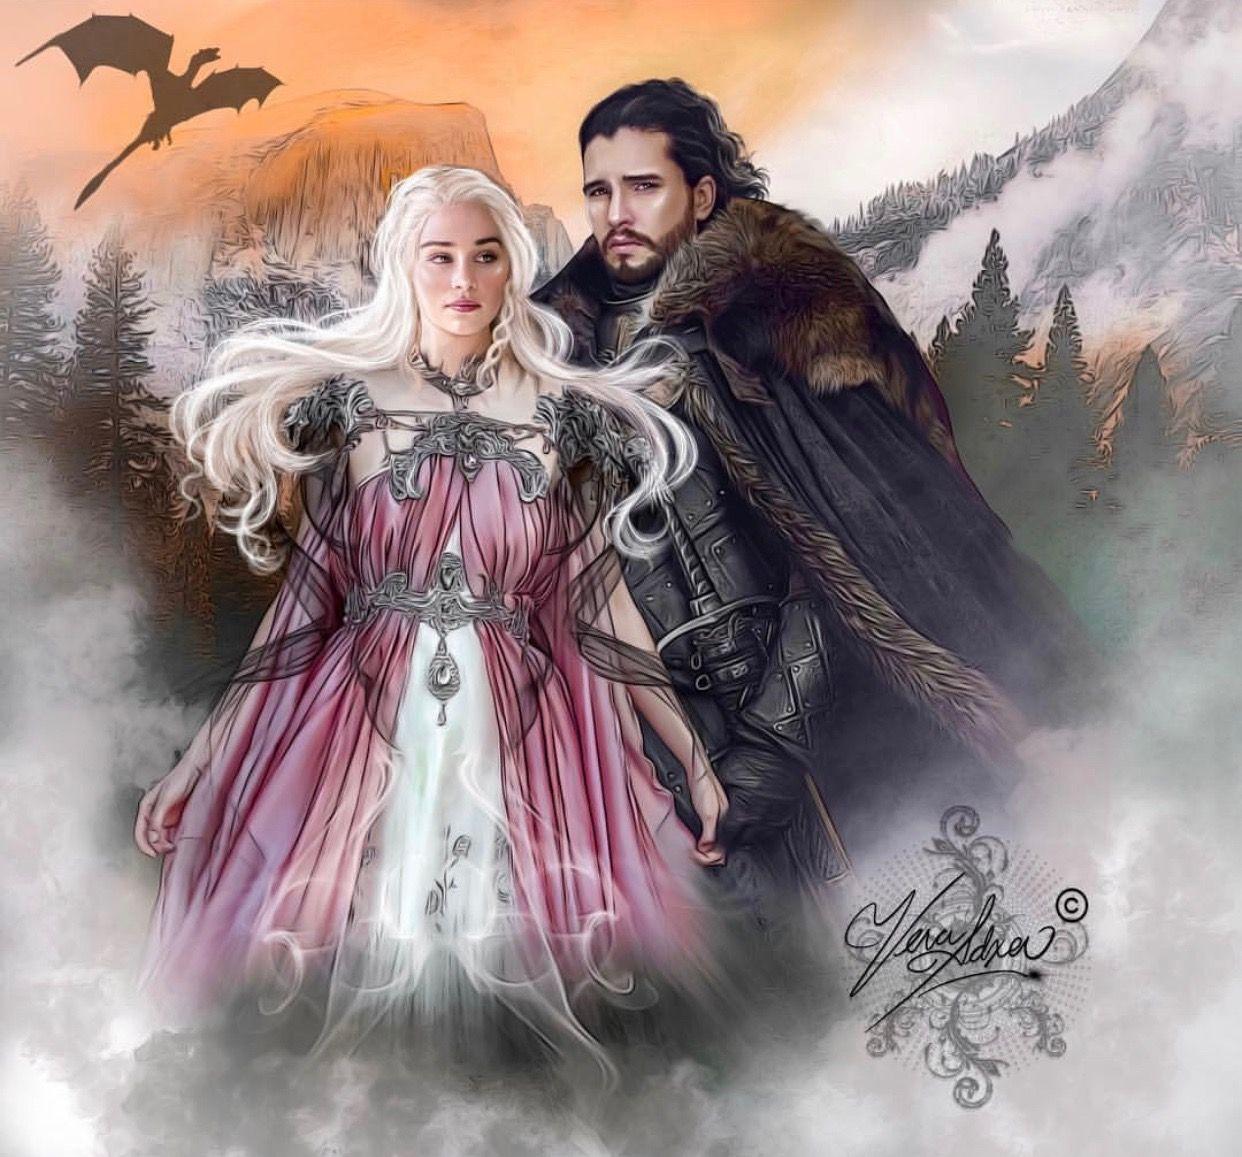 Vera Adxer Got Daenerys Targaryen Jon Snow Daenerys And Jon Jon Snow And Daenerys Fan Art